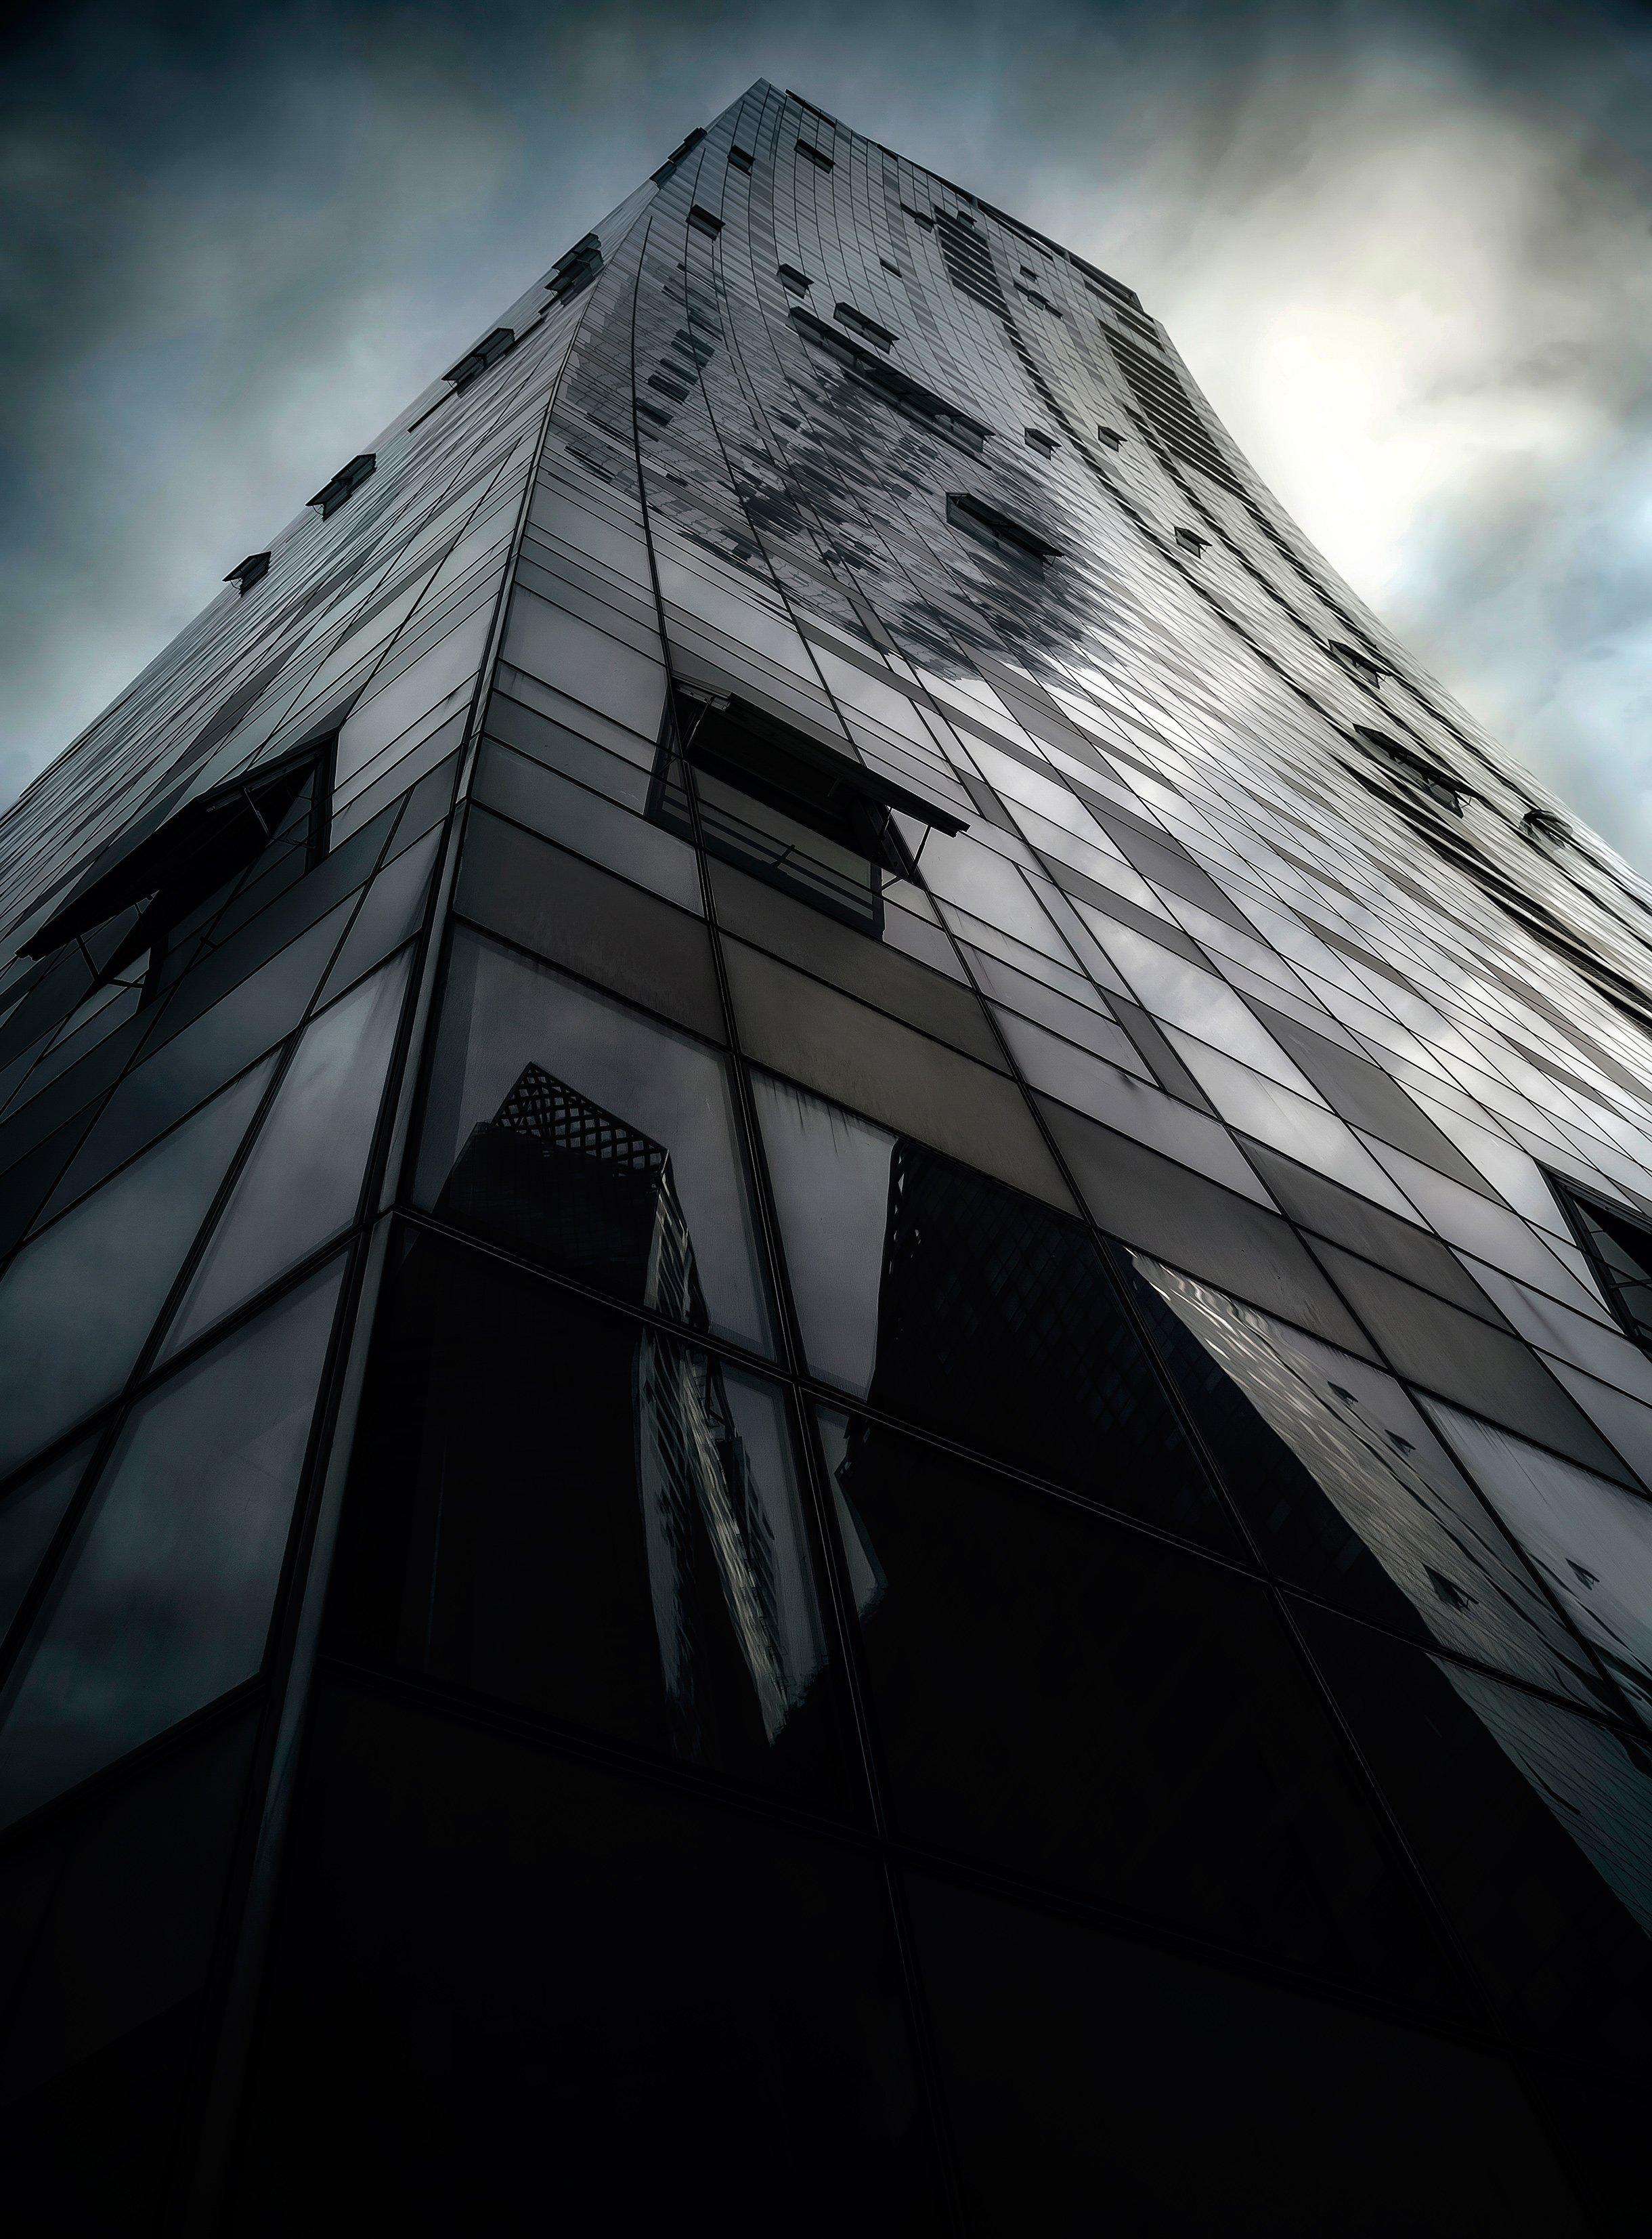 архитектура, город, сингапур, азия, небоскреб, Алексей Ермаков